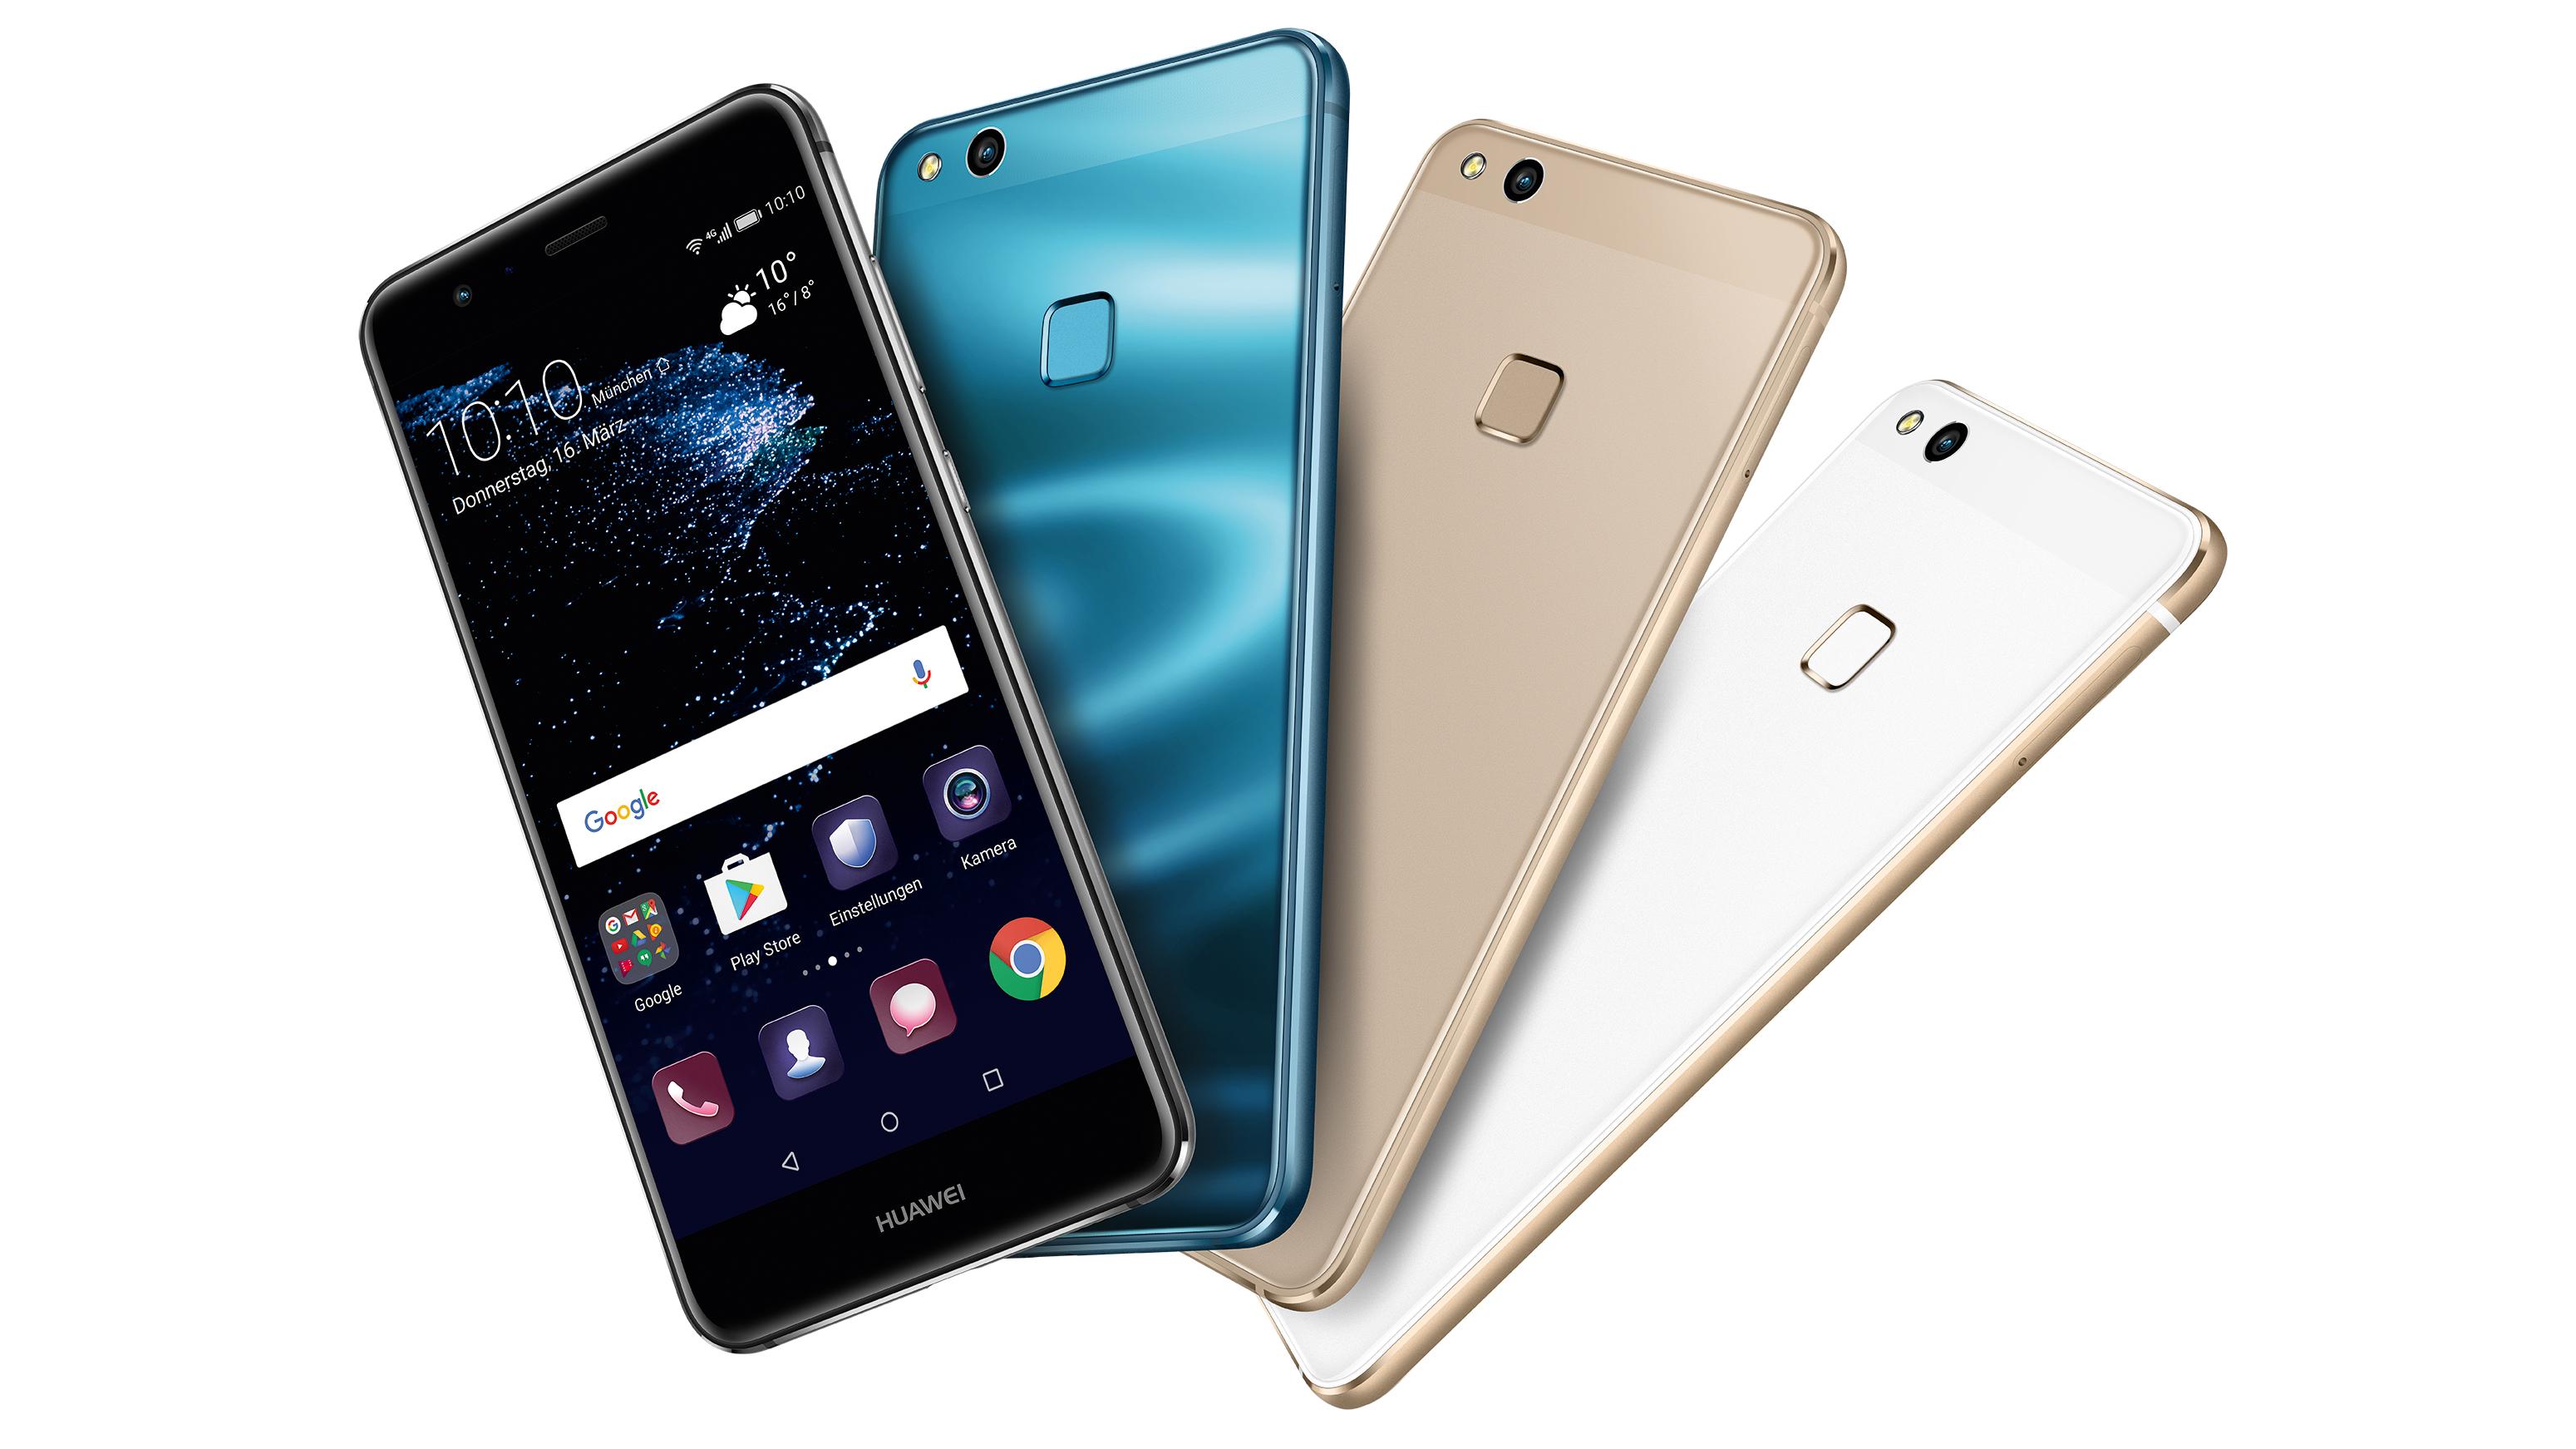 Huawei P10 Lite Smartphone Review - NotebookCheck.net Reviews